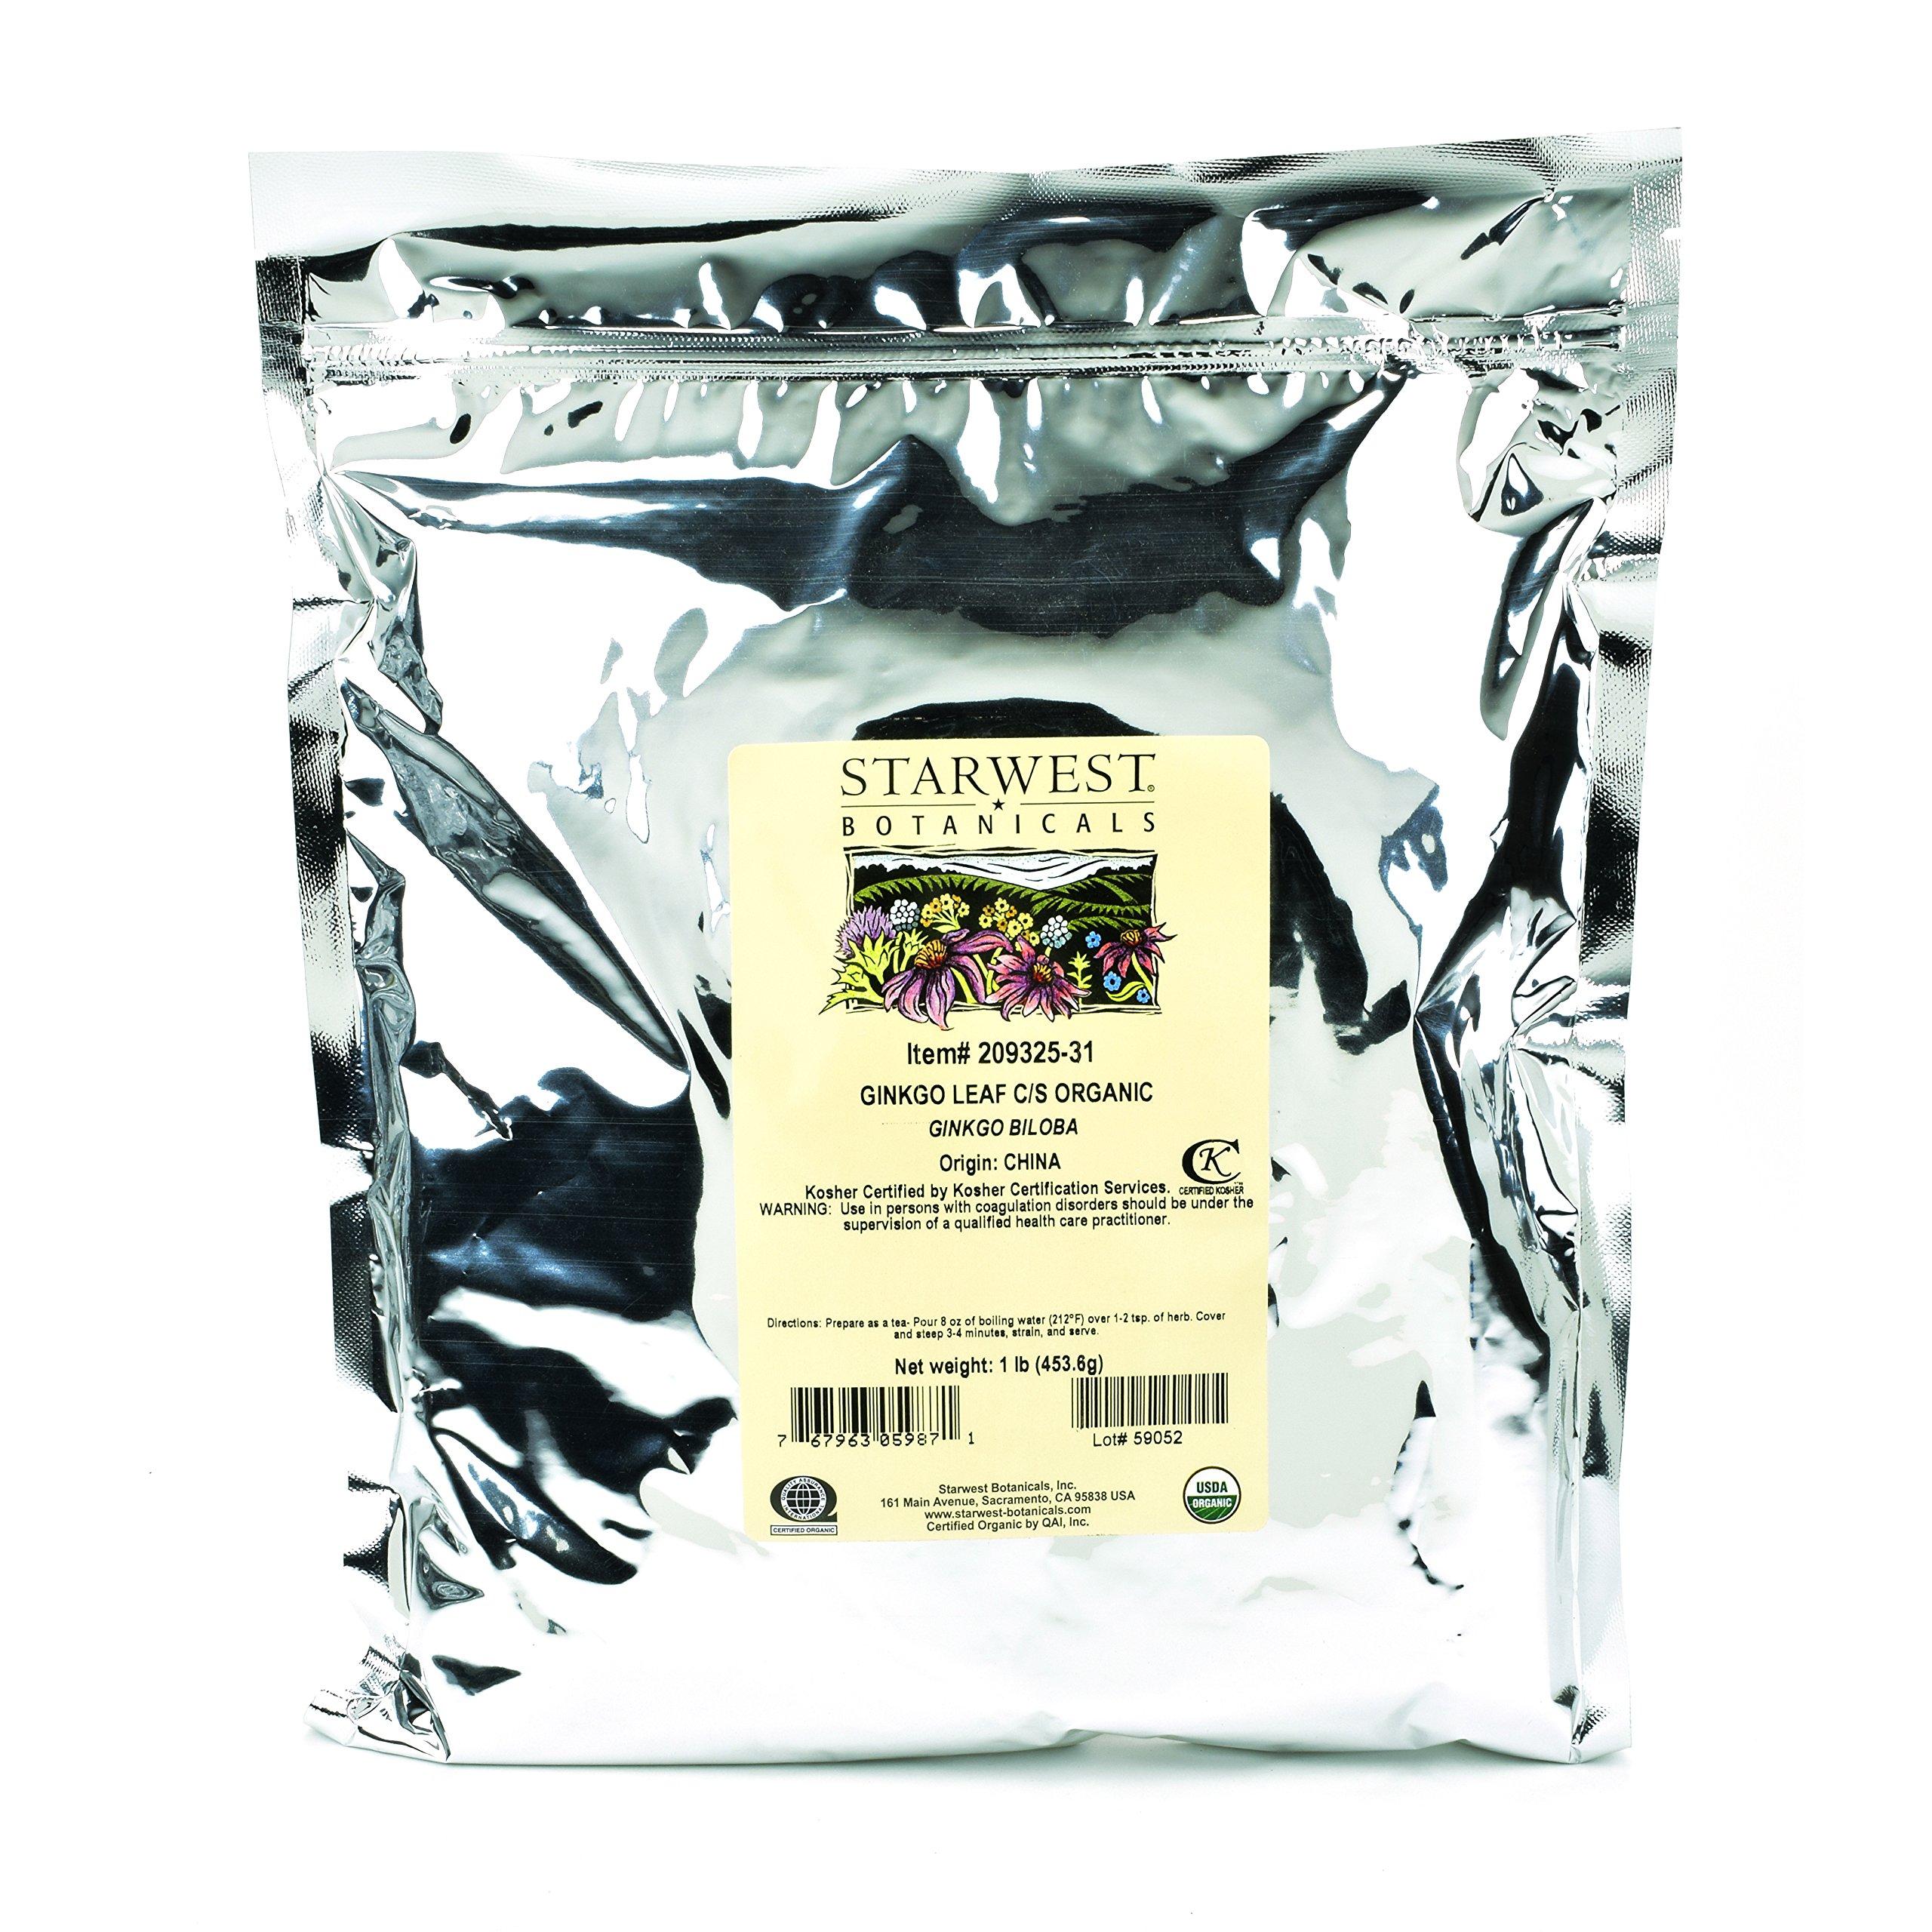 Starwest Botanicals Organic Ginkgo Leaf C/S, 1 Pound